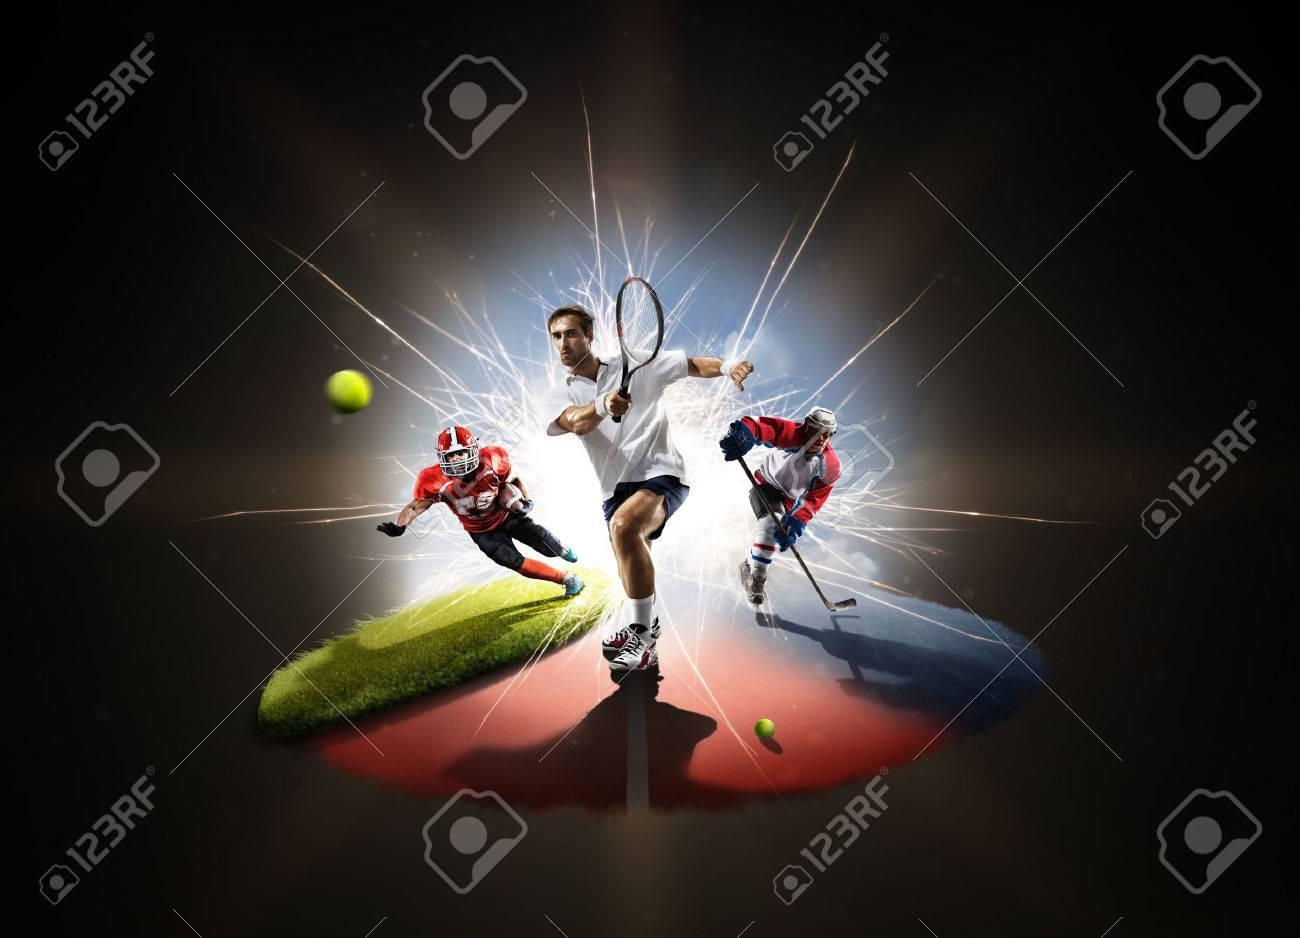 Multi sports collage tennis hockey american footbal - 60366667